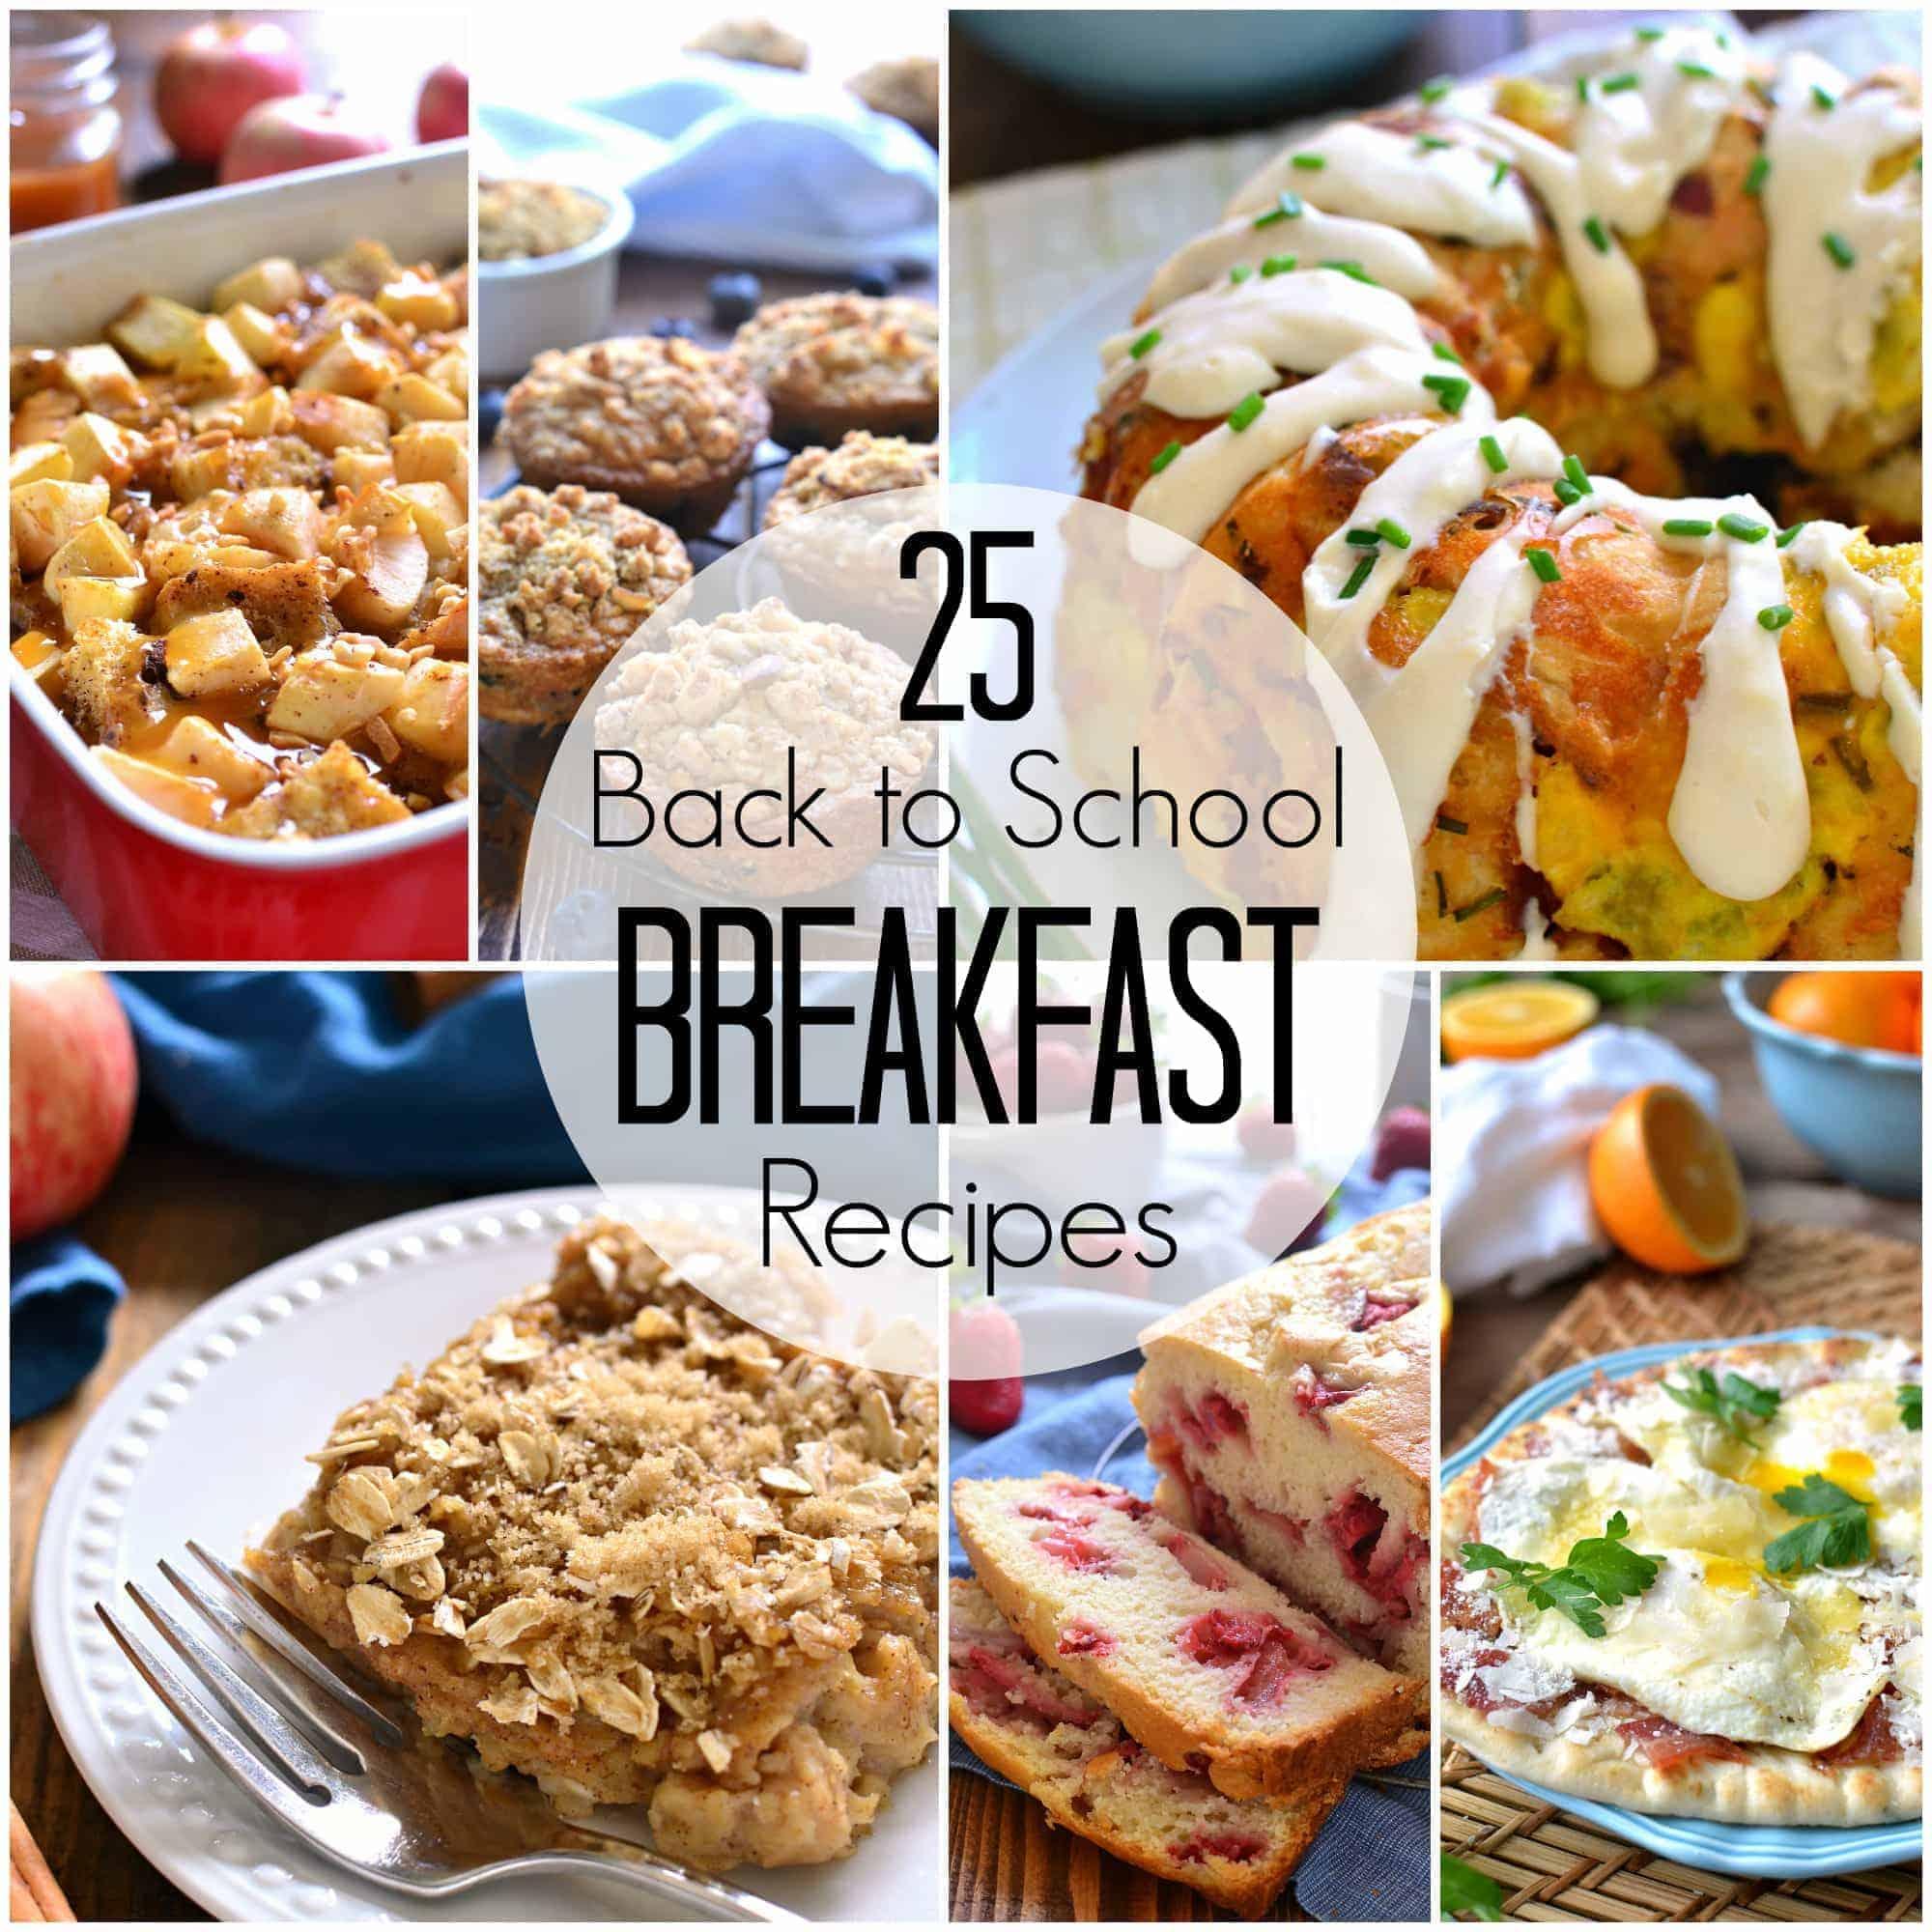 25 Back to School Breakfast Recipes Square25 kid-tested Breakfast Recipes - just in time for back to school!